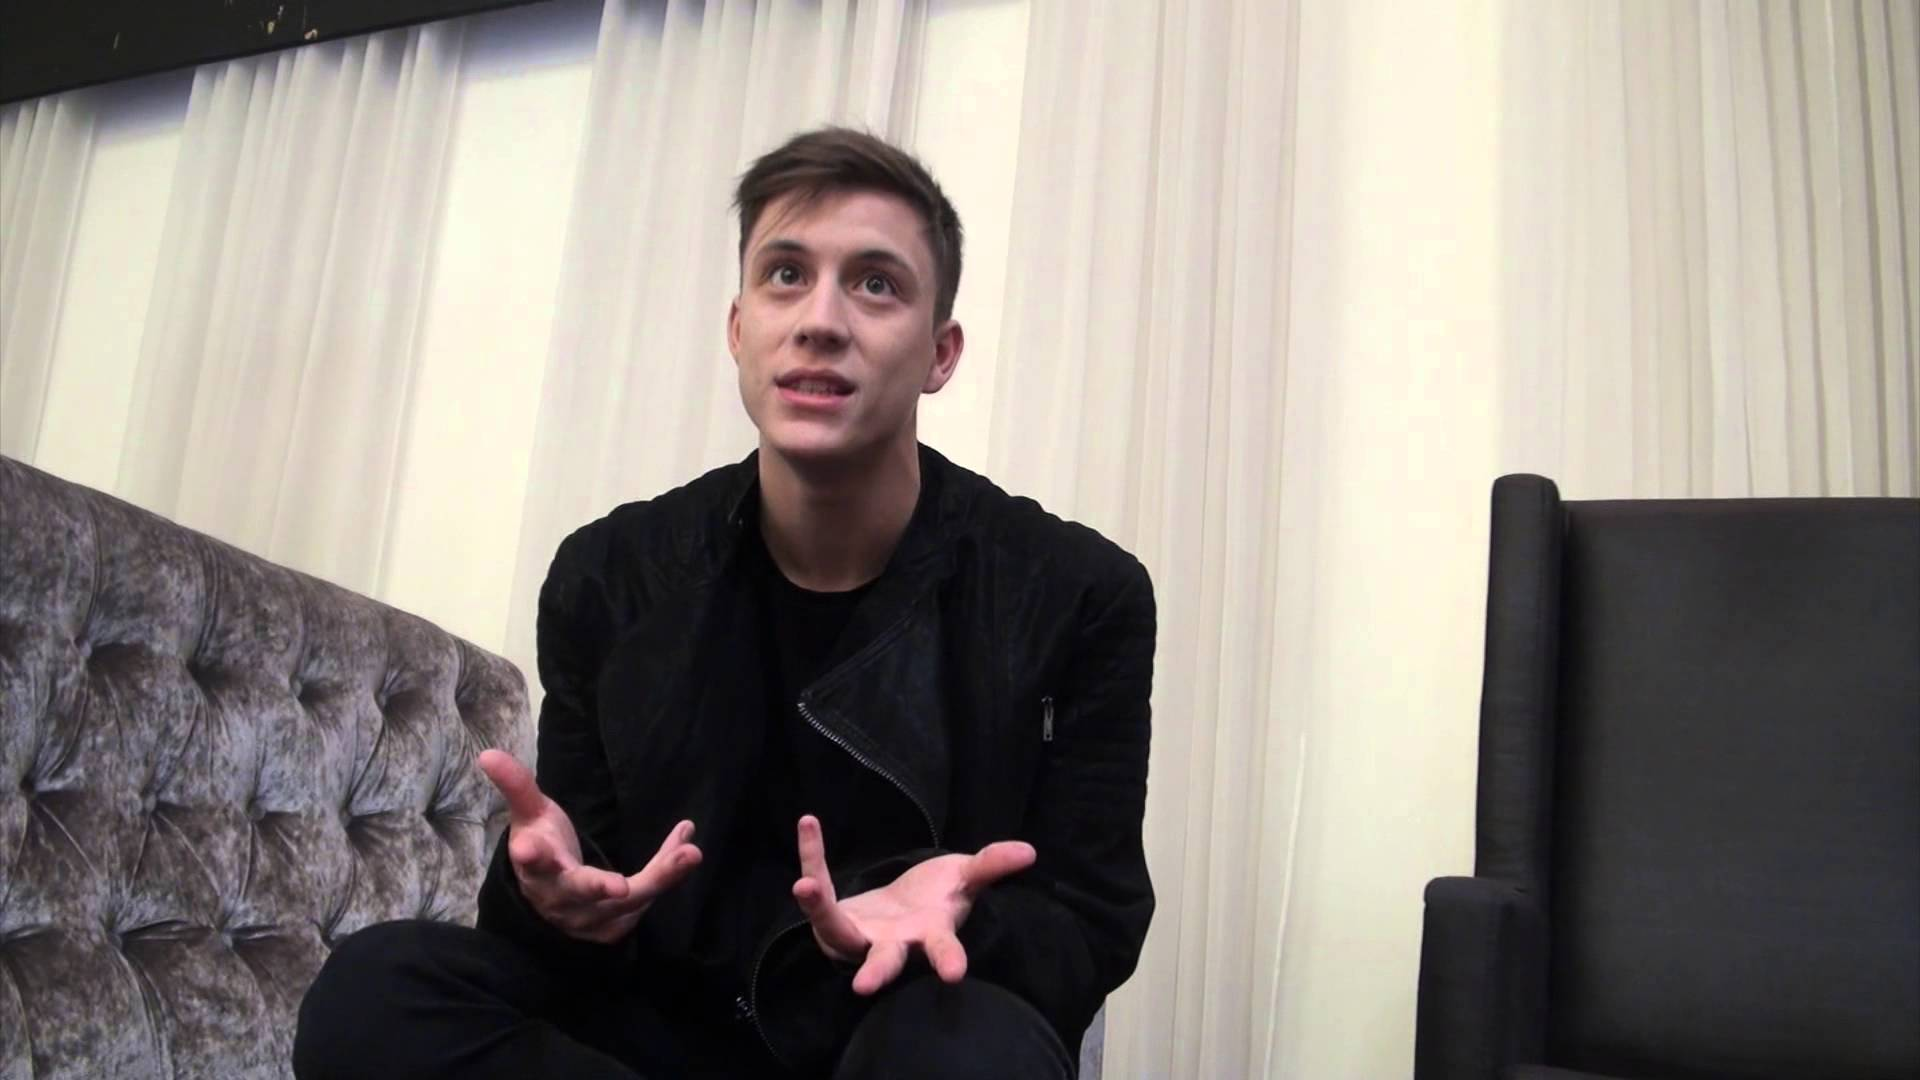 Interview mit Loïc Nottet